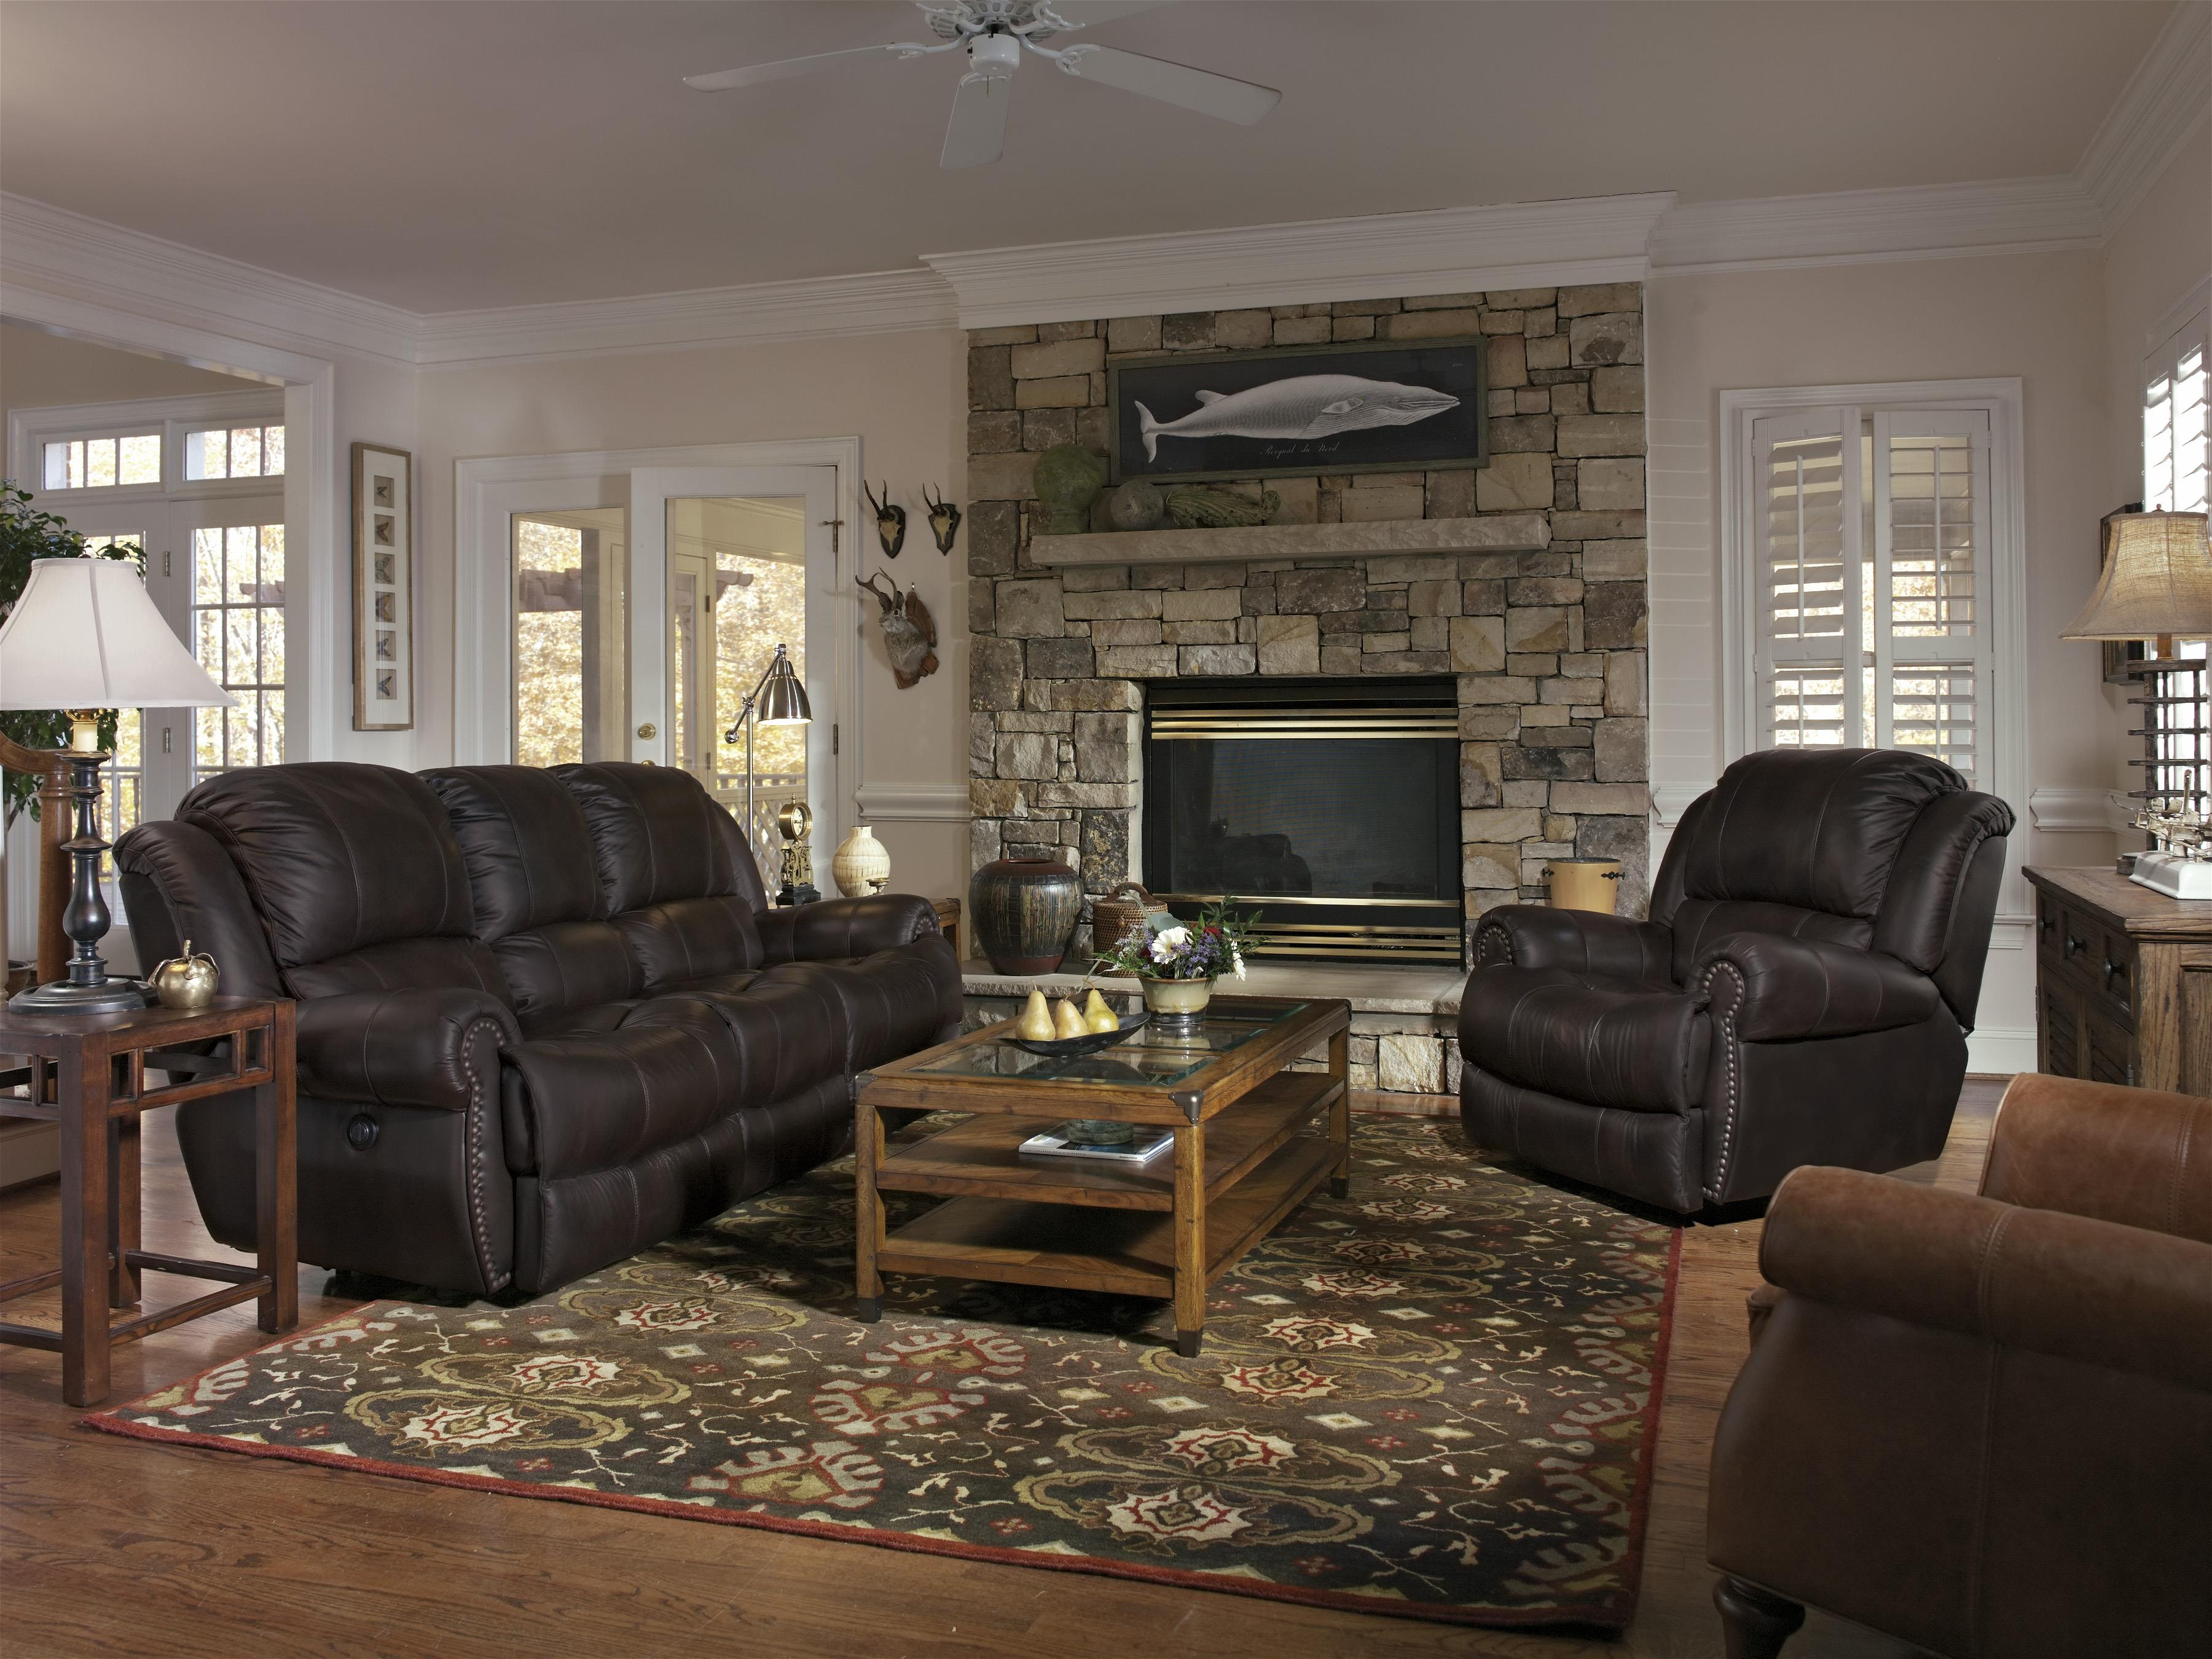 flexsteel capitol double reclining sofa set designs photo gallery  roselawnlutheran